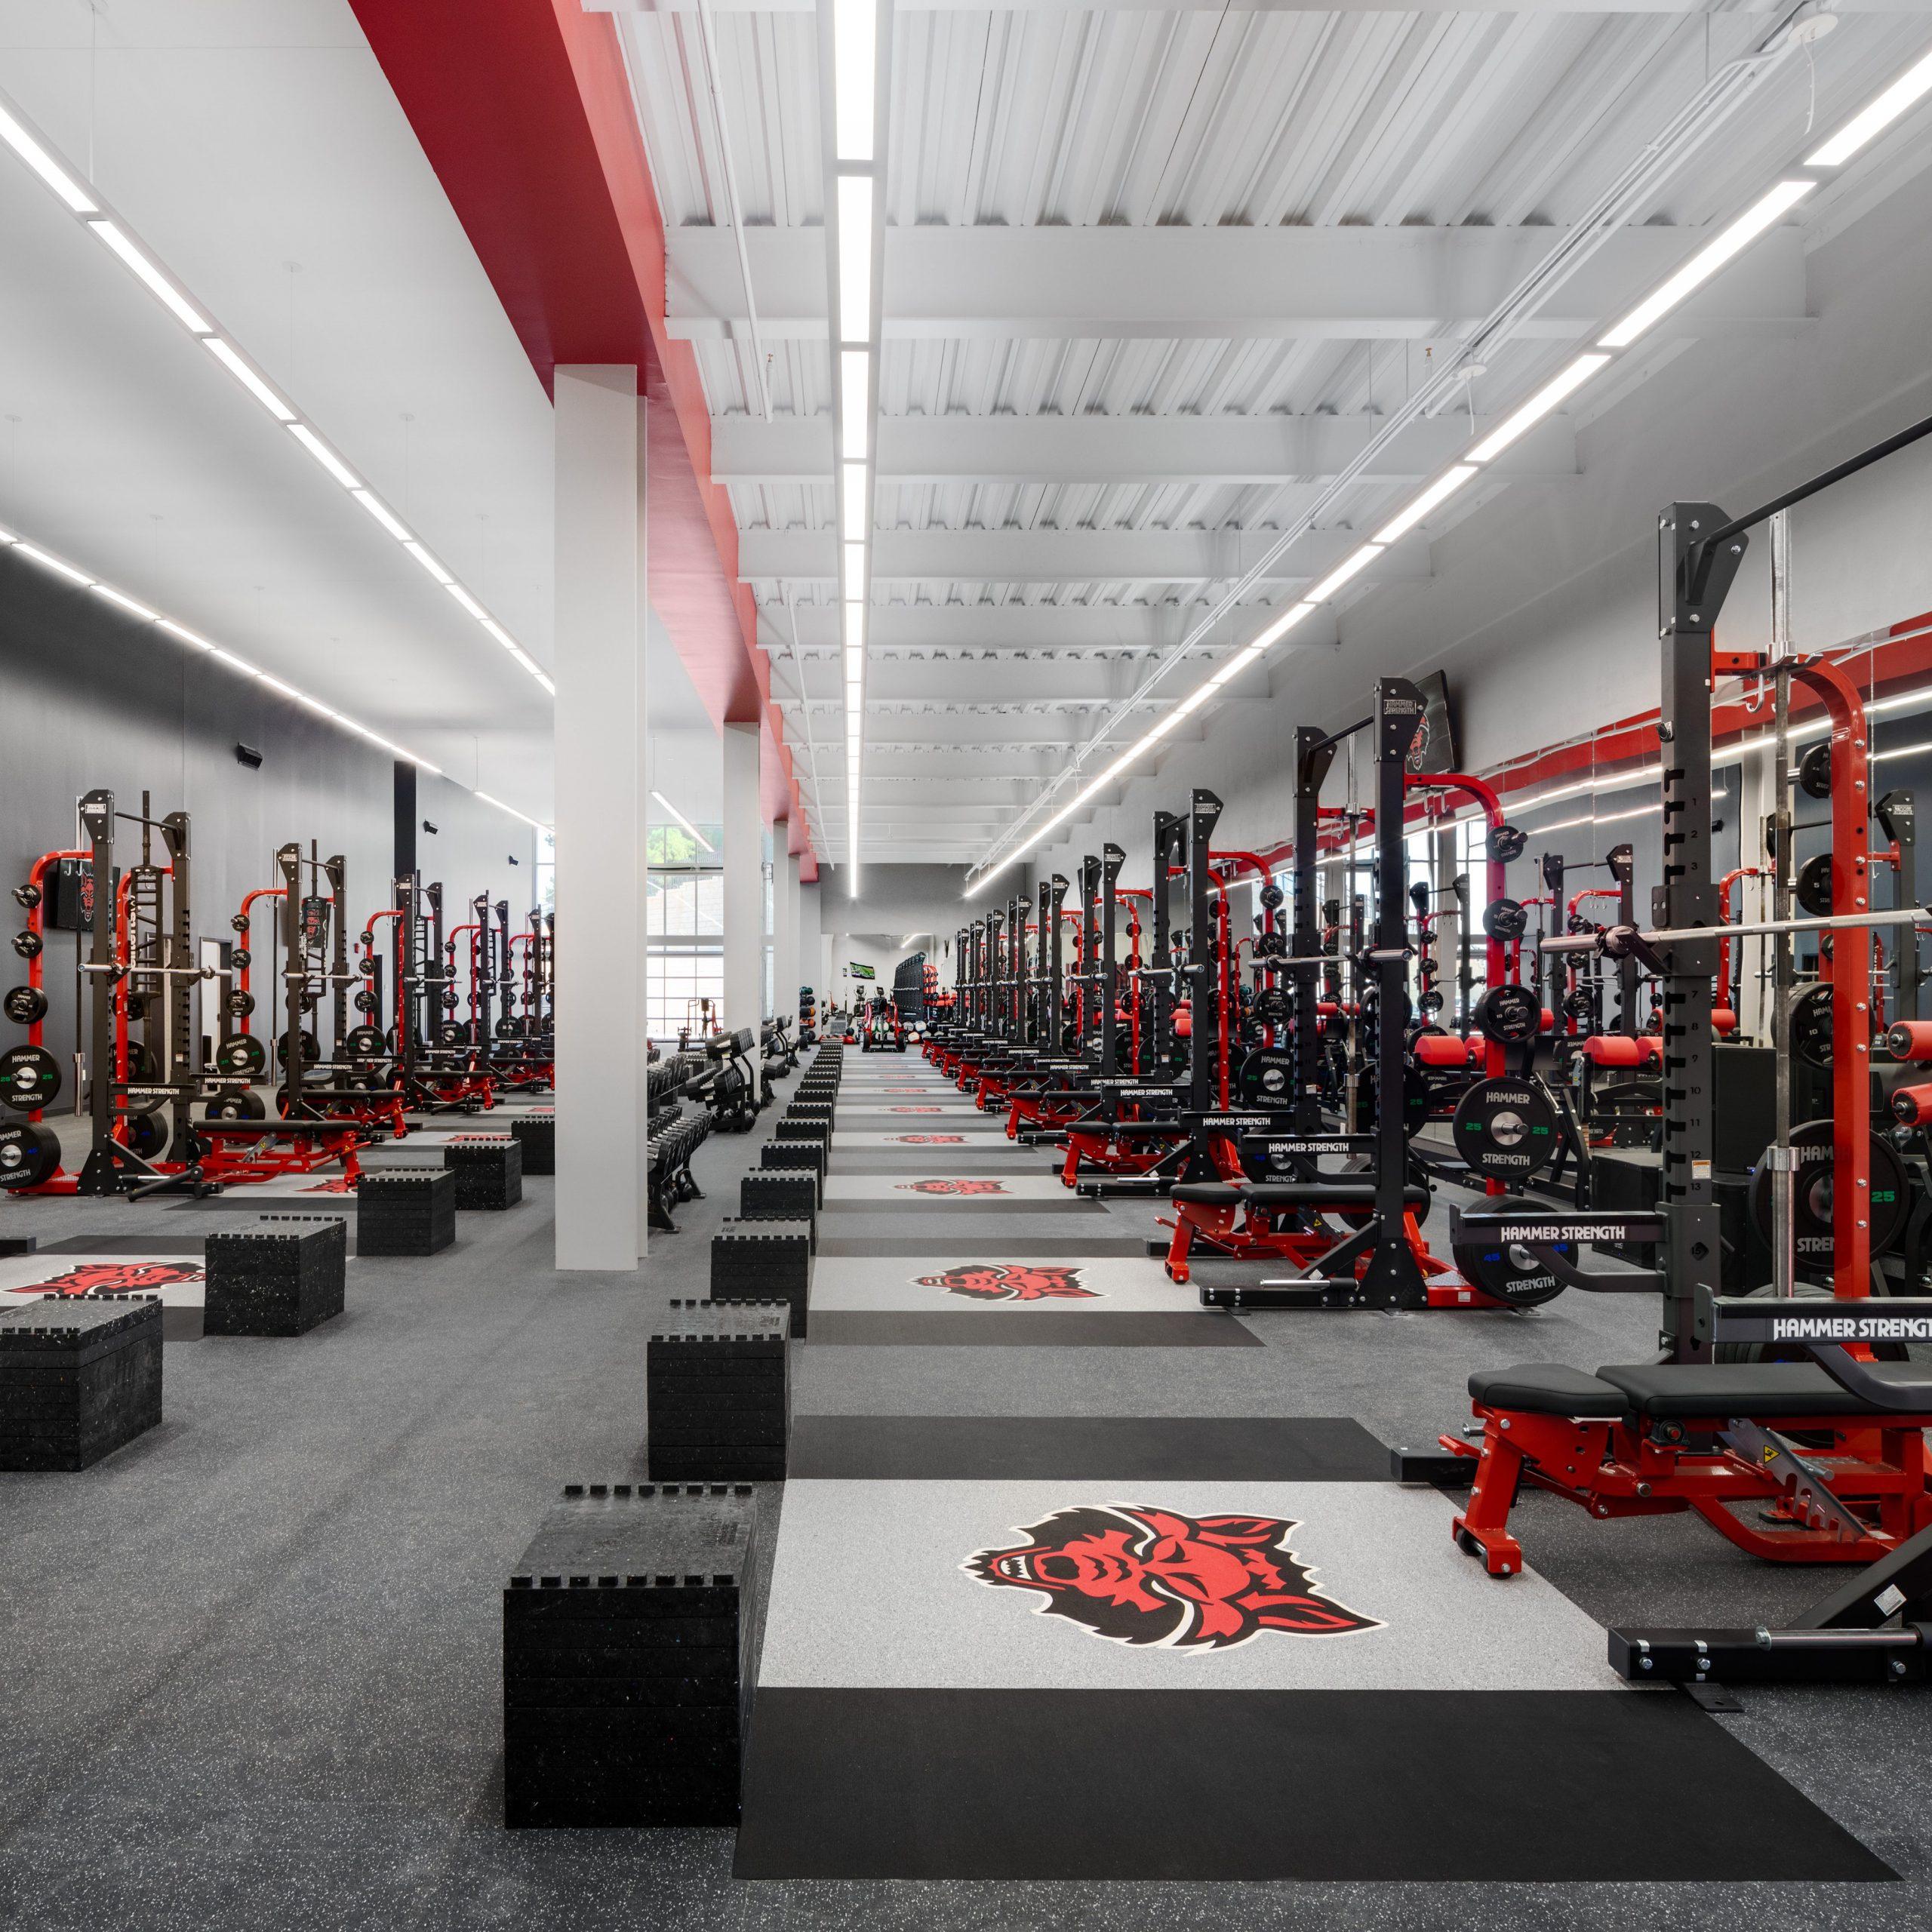 ASU Football opps weight room